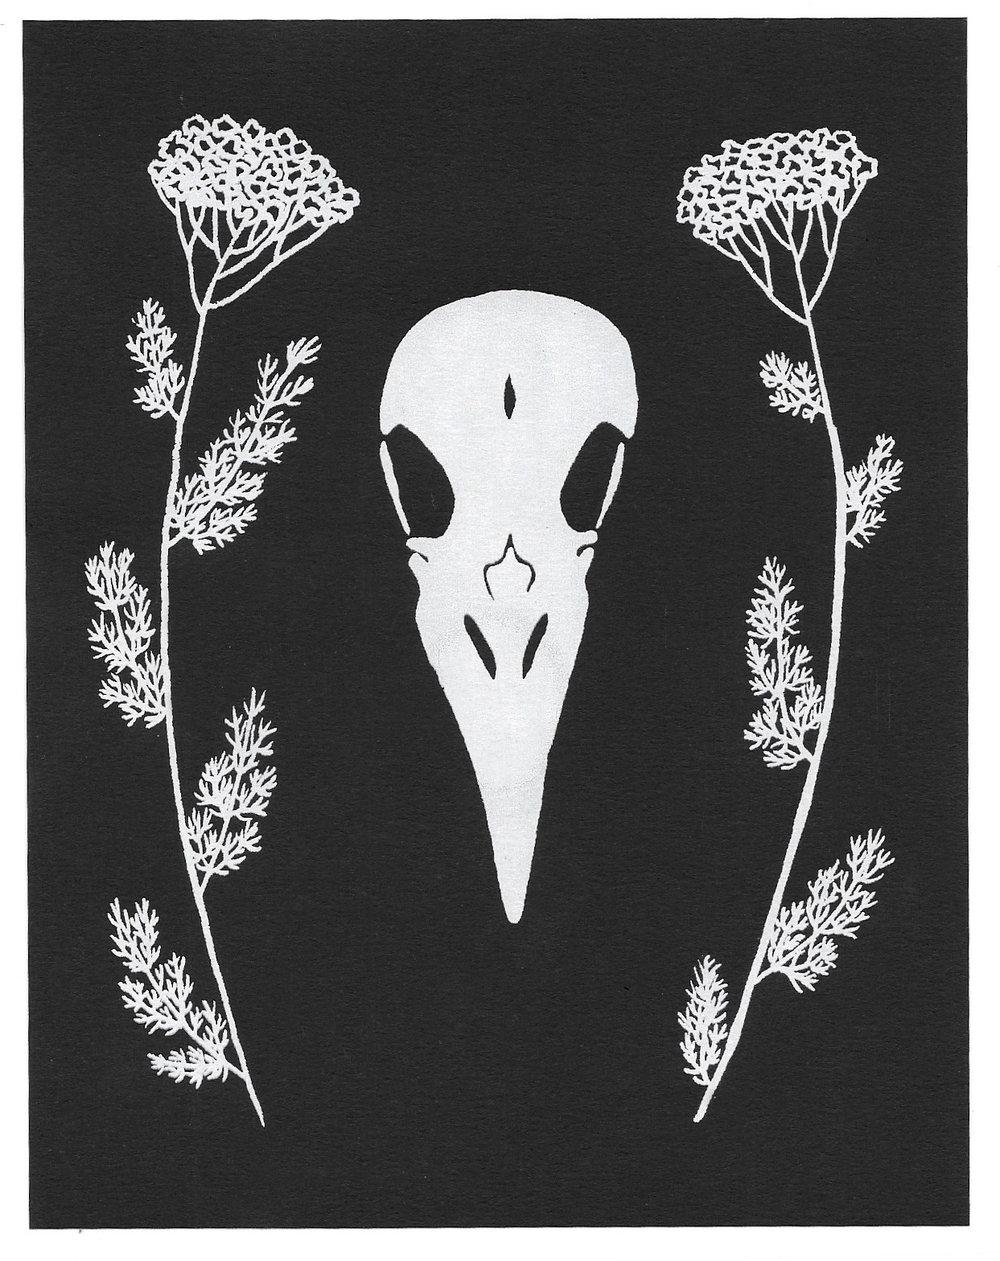 omens (crow skull + yarrow)